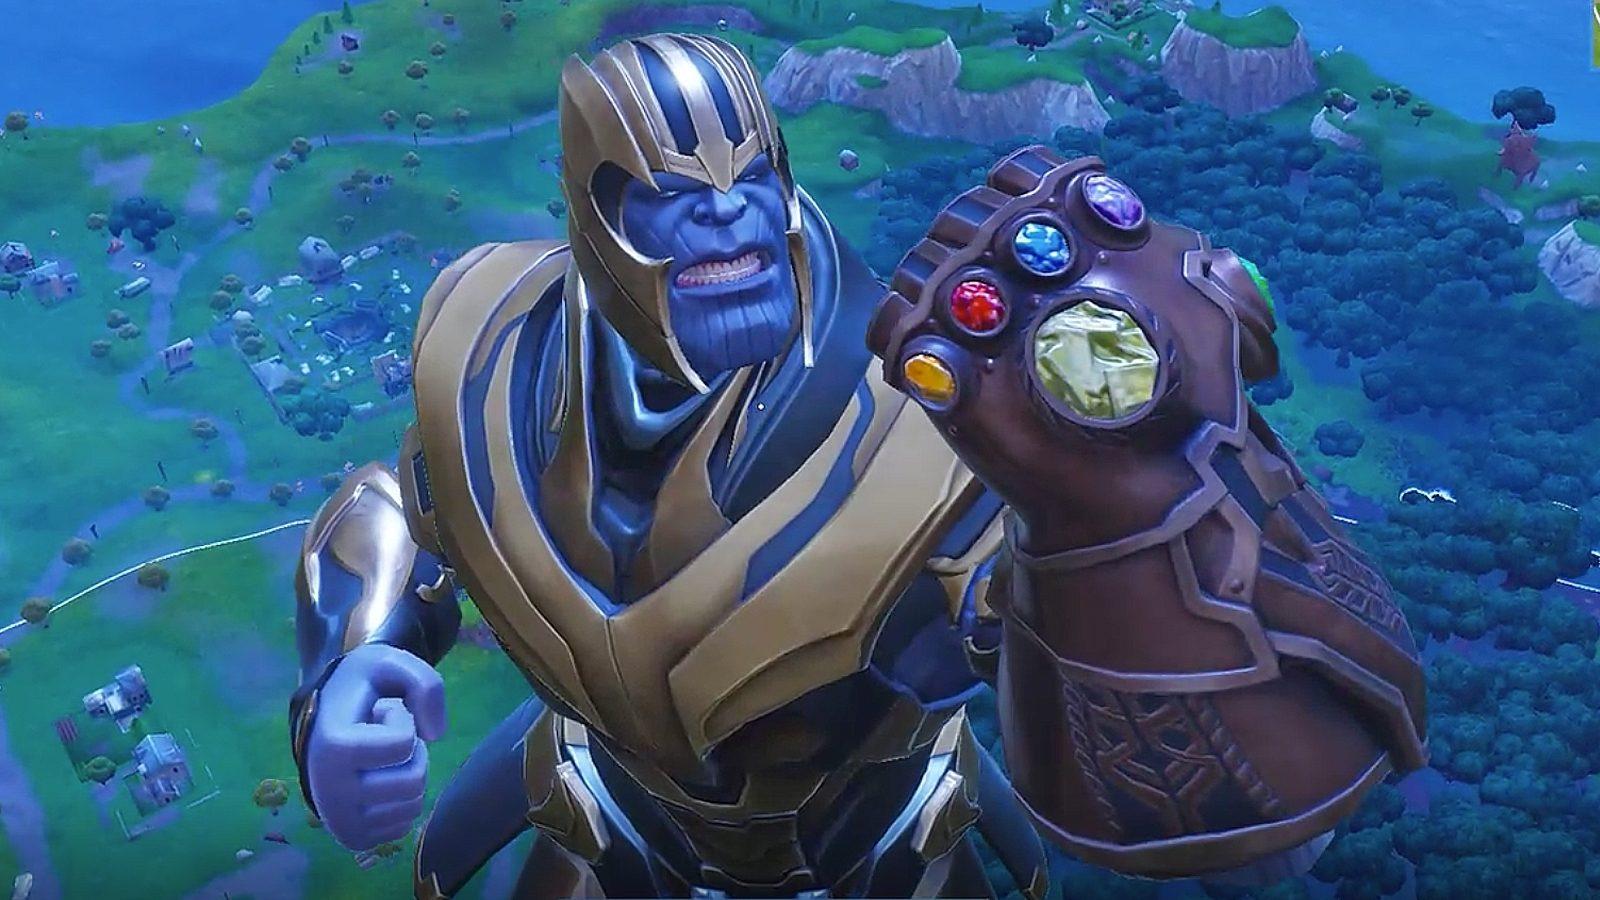 Fortnite's 'Infinity Gauntlet' event ends tomorrow screenshot